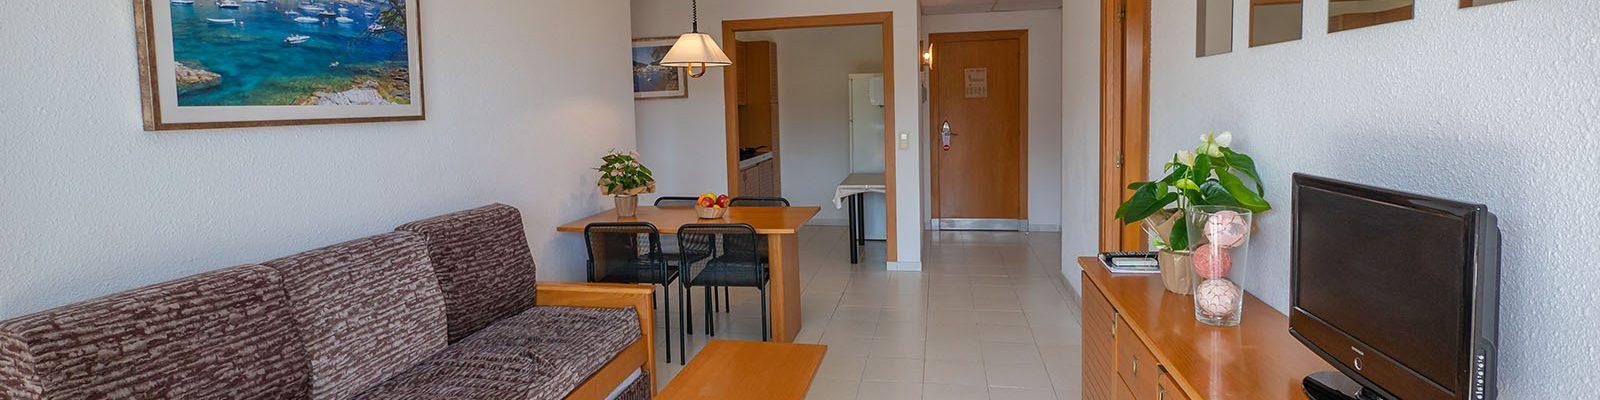 Apartamento E Salon